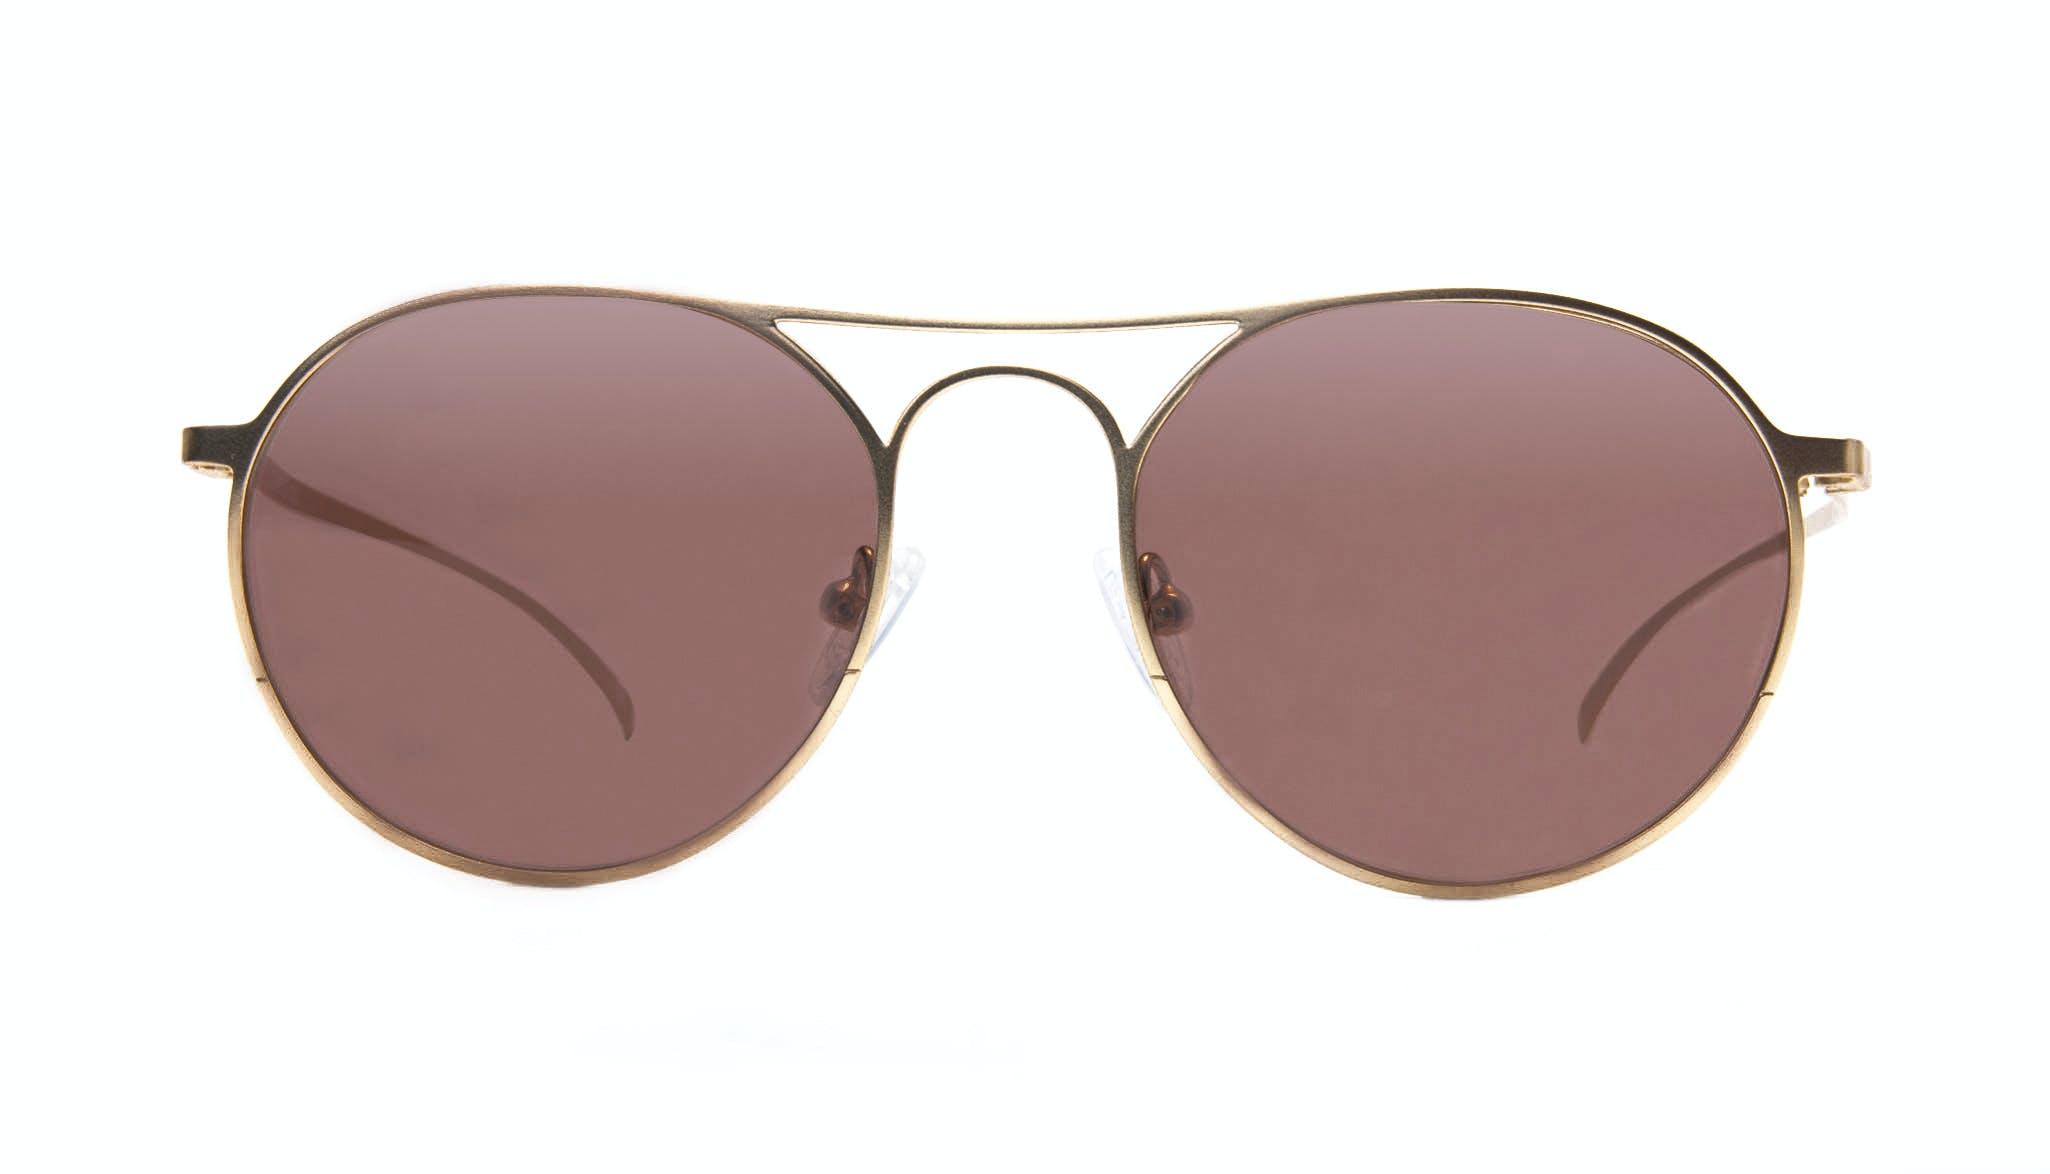 Affordable Fashion Glasses Aviator Round Sunglasses Men Contour Gold Front